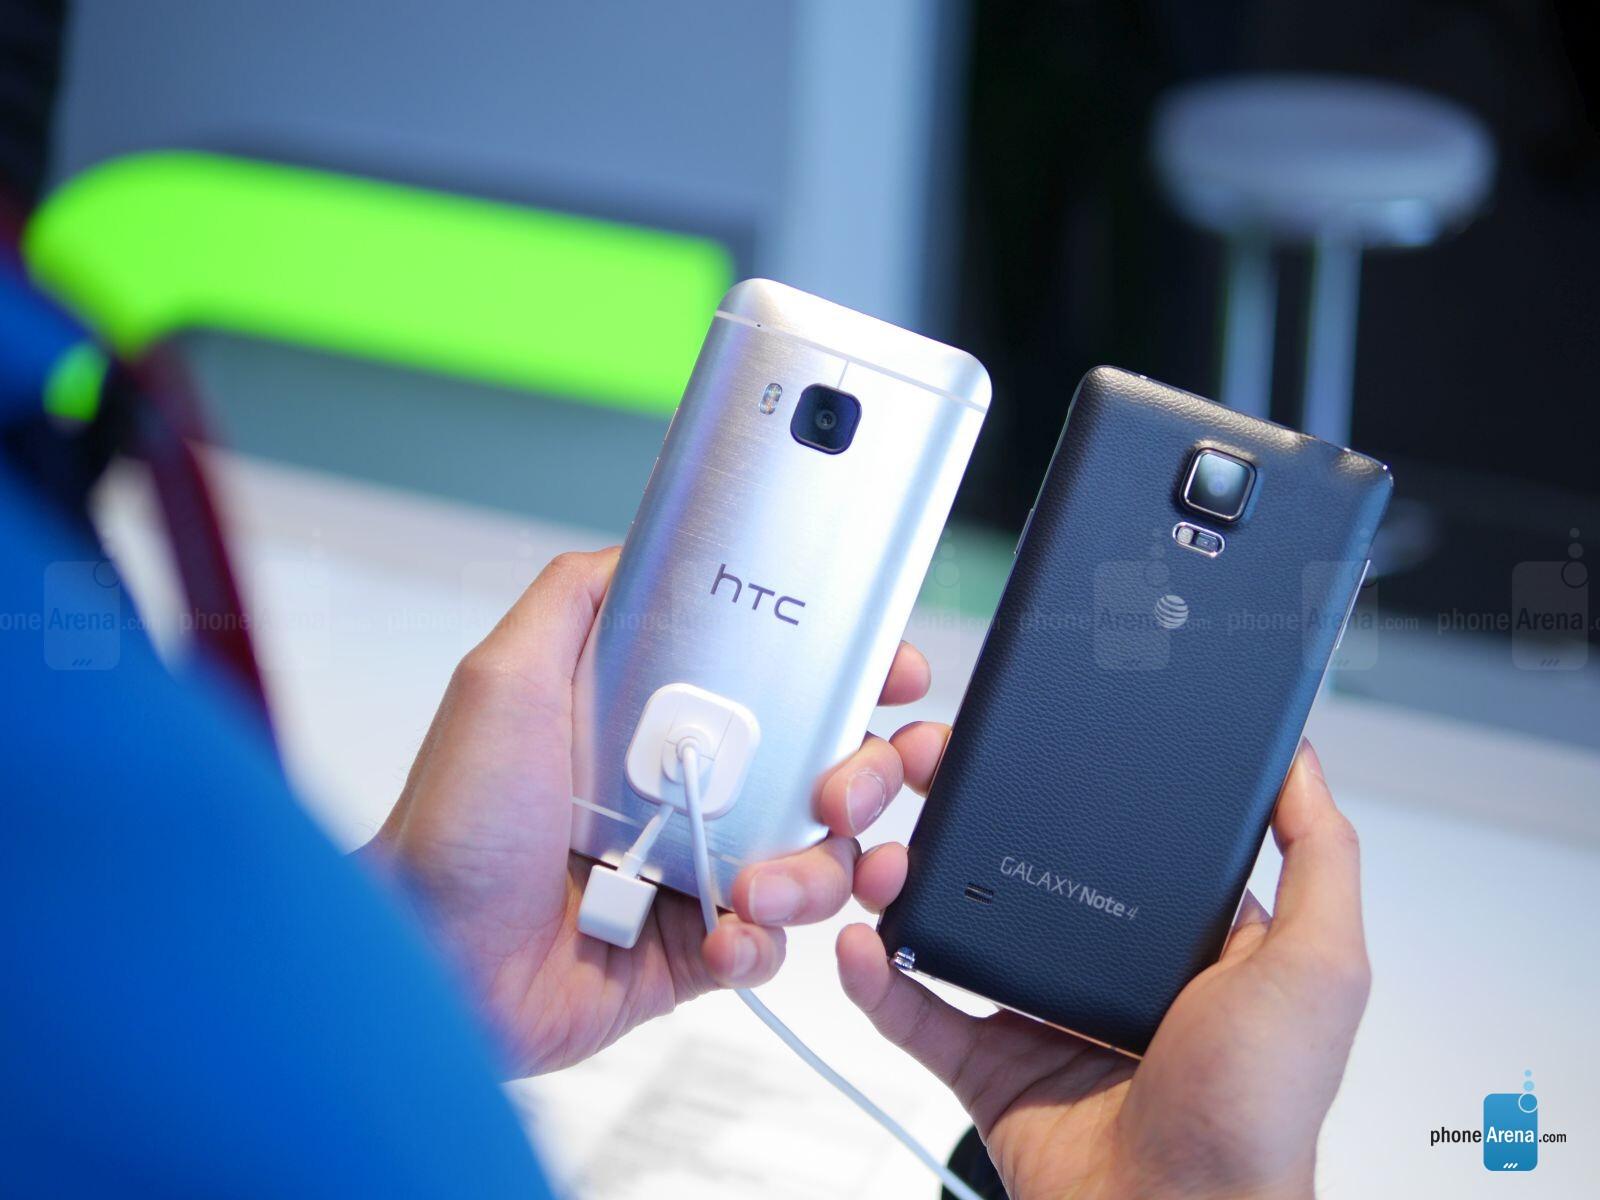 Samsung galaxy note 5 vs htc one m9 plus a comparison - Htc One M9 Vs Samsung Galaxy Note 4 First Look